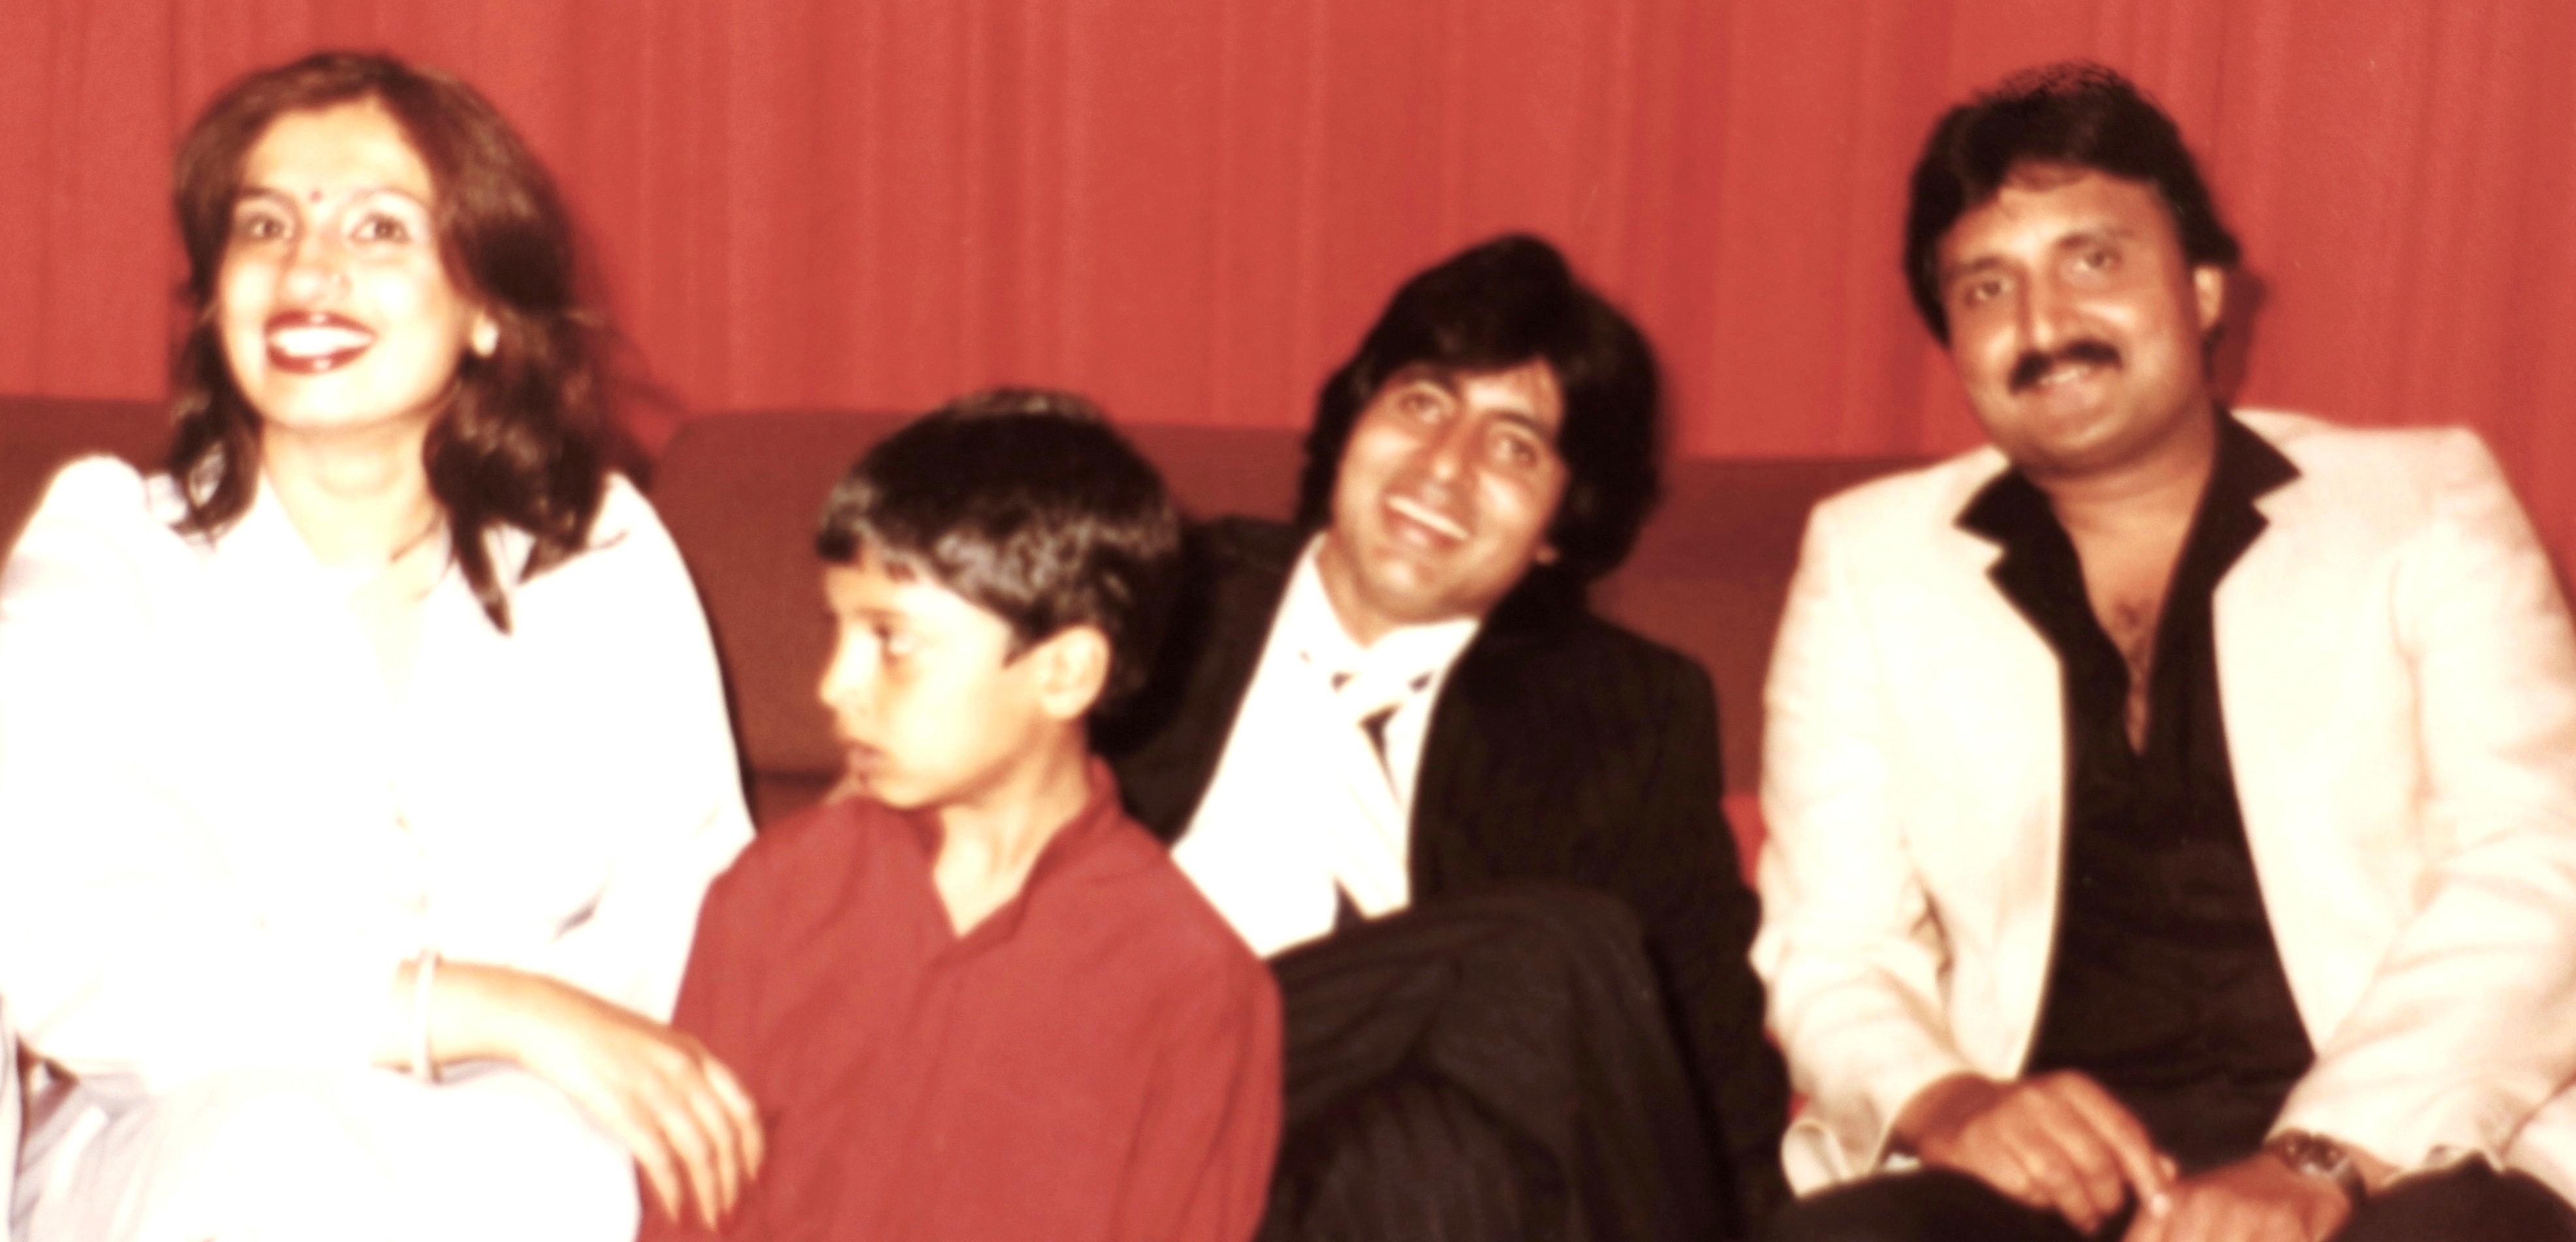 Амит-джи. Фото - Страница 10 Nitu-Kunal-Amitabh-Bachchan-Mahesh